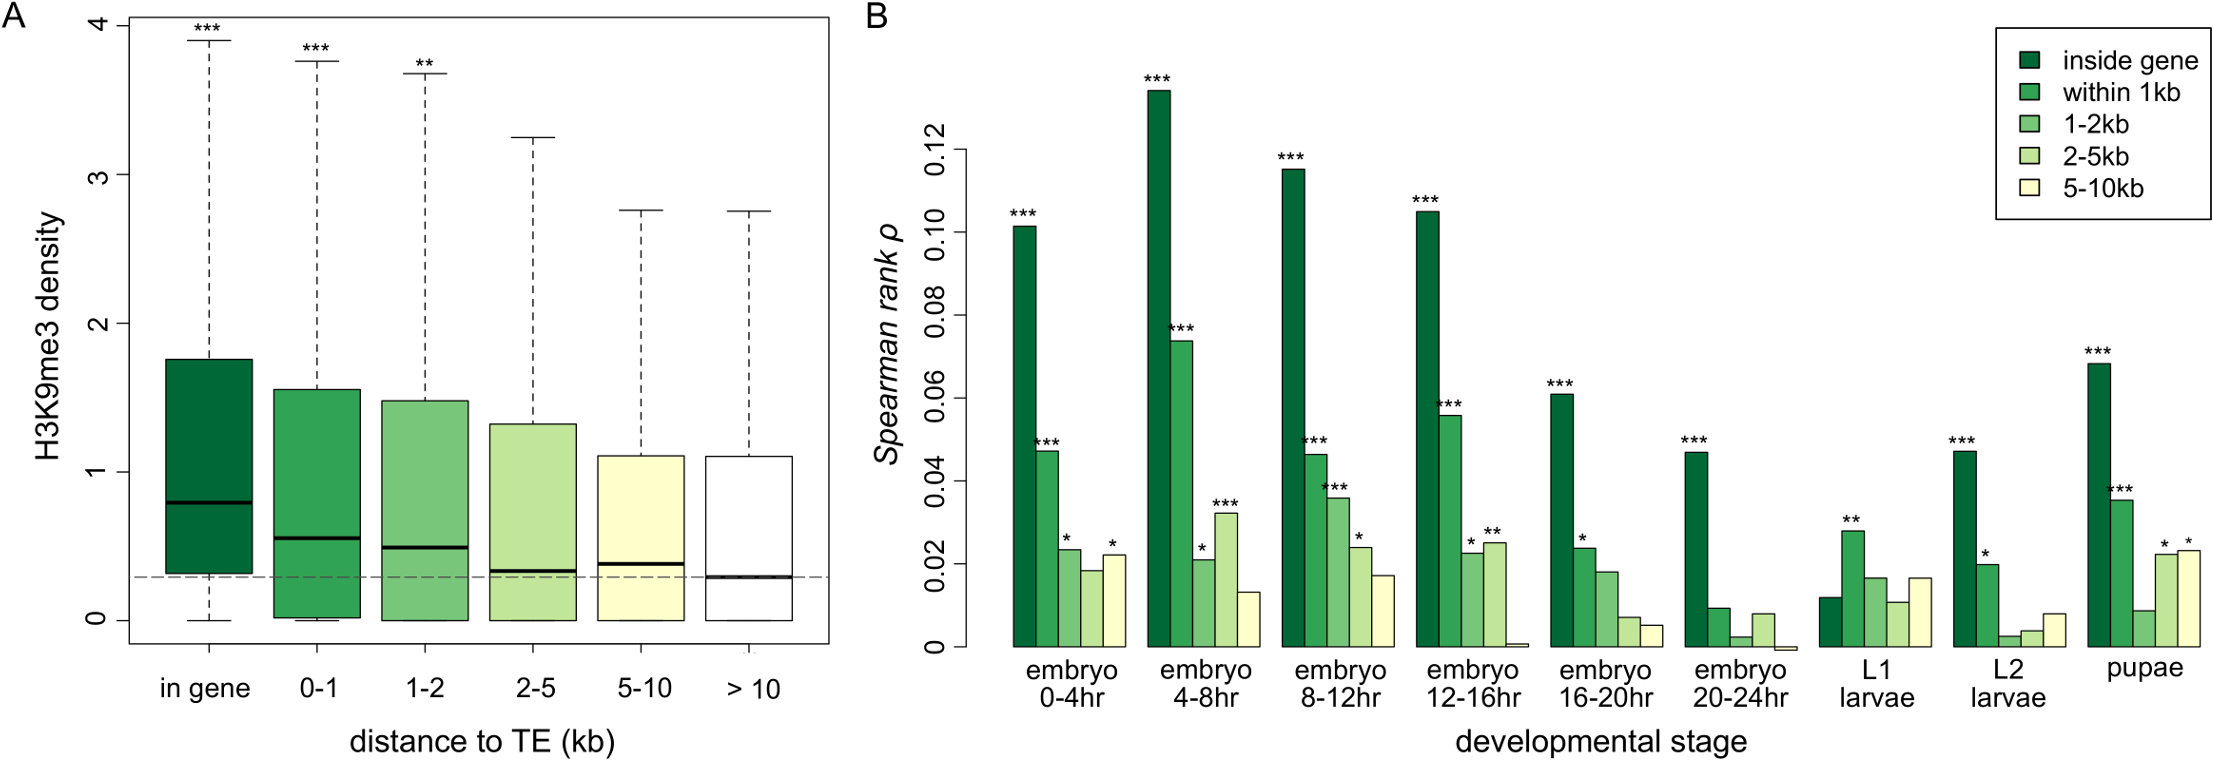 The associations between H3K9me3 density of genes and their neighborhood TE content.